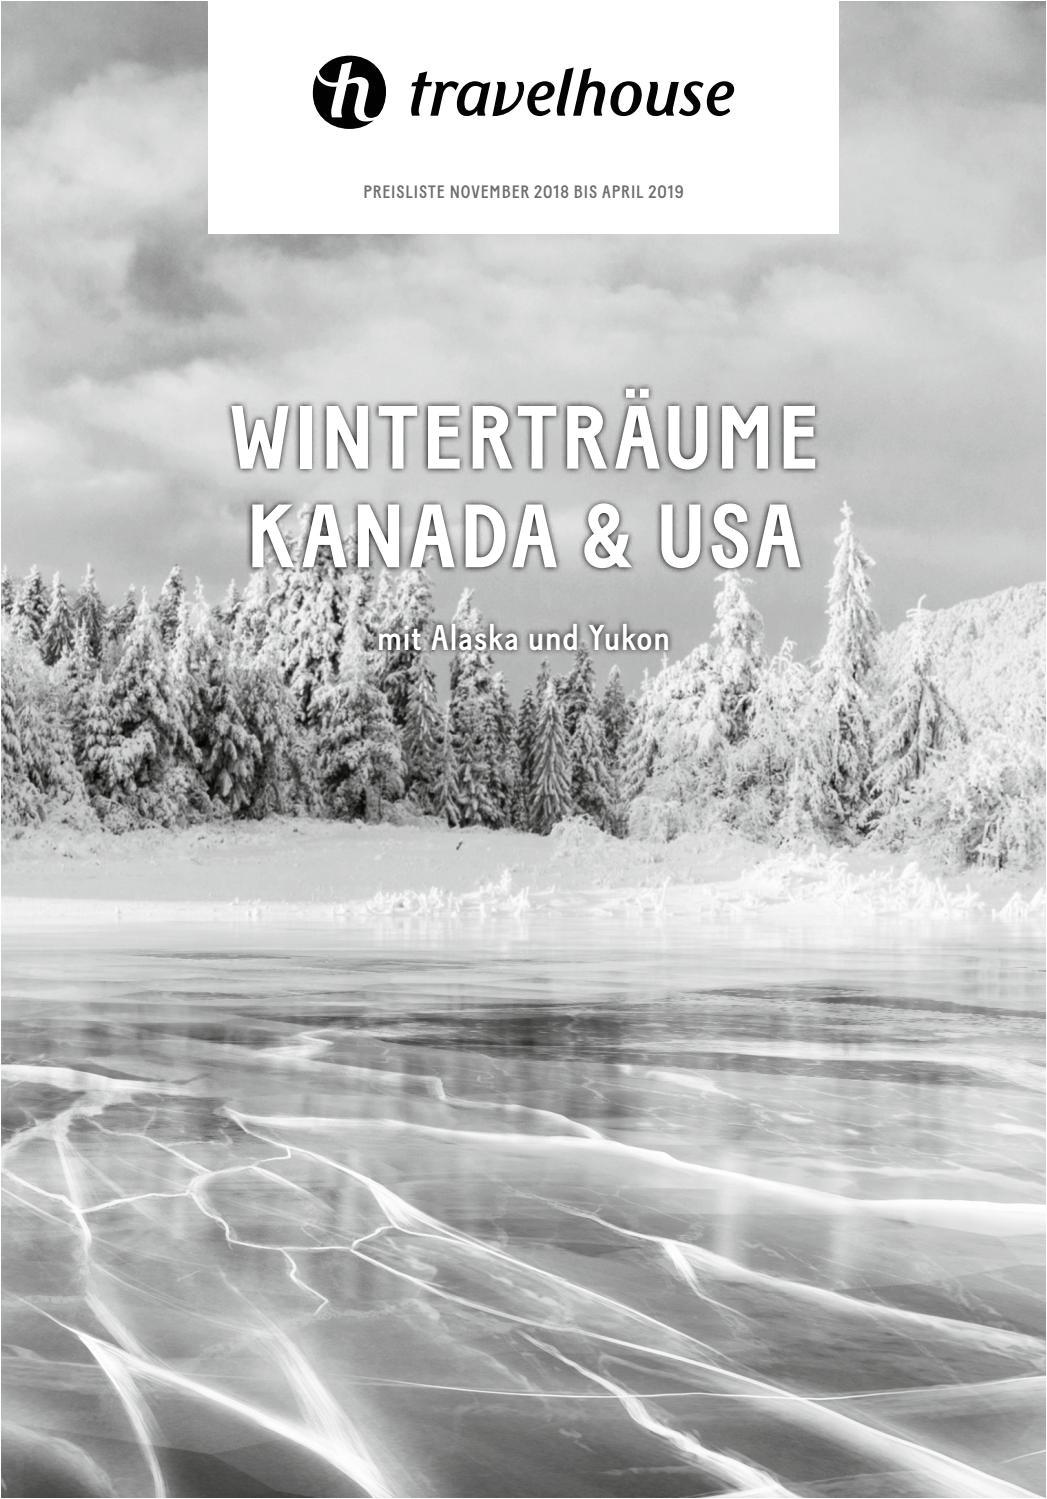 Silver Stag Woods and Water Price Preisliste Travelhouse Wintertraume Kanada Usa November 18 Bis